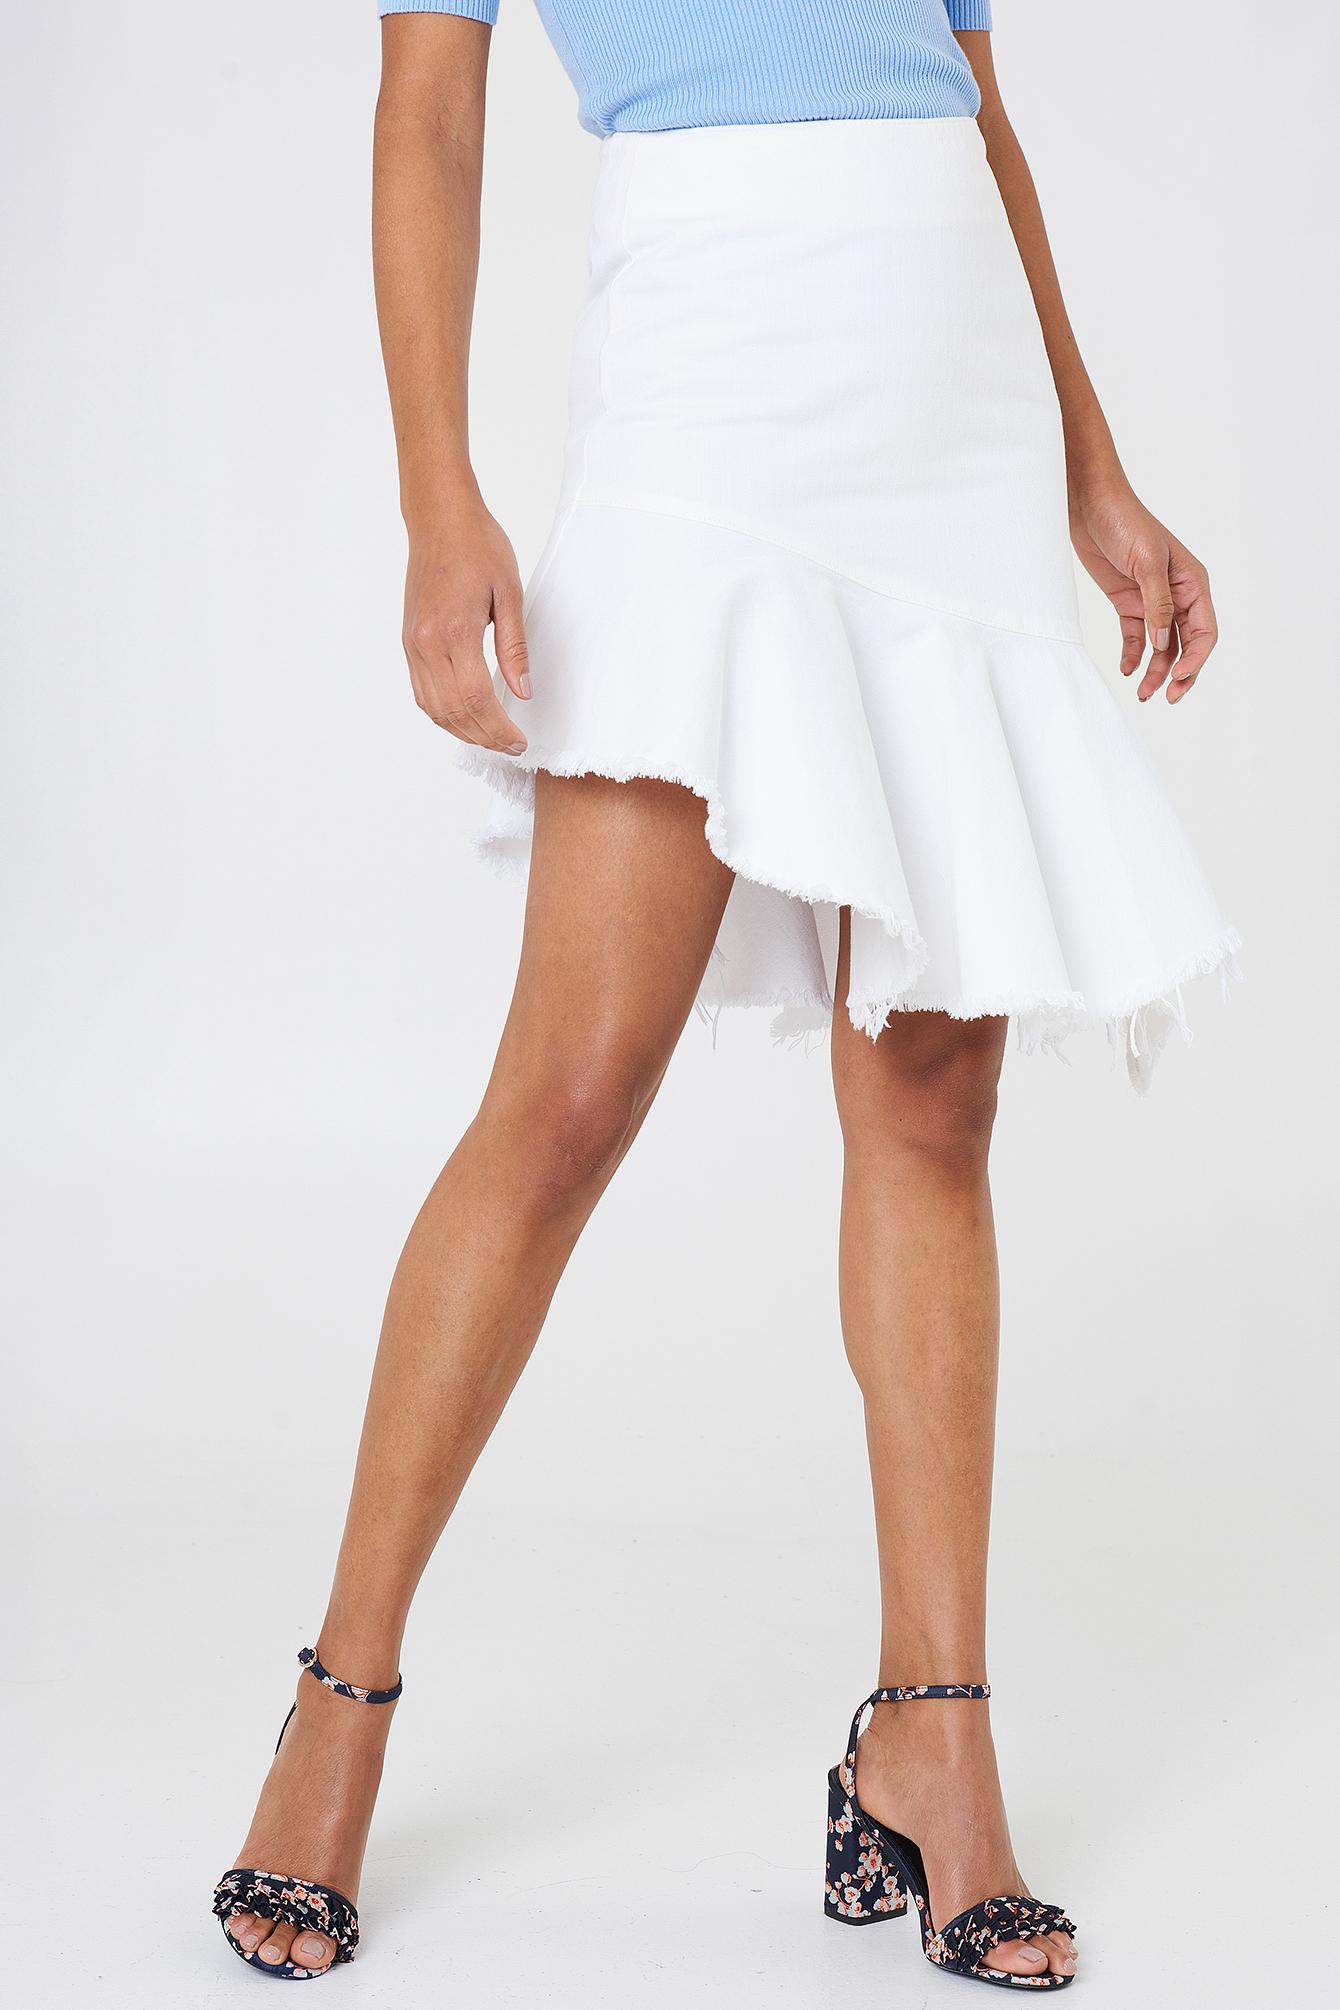 Véritable Vente NA-KD Raw Hem Midi Denim Skirt Date De Sortie Du Jeu XnsENEkd